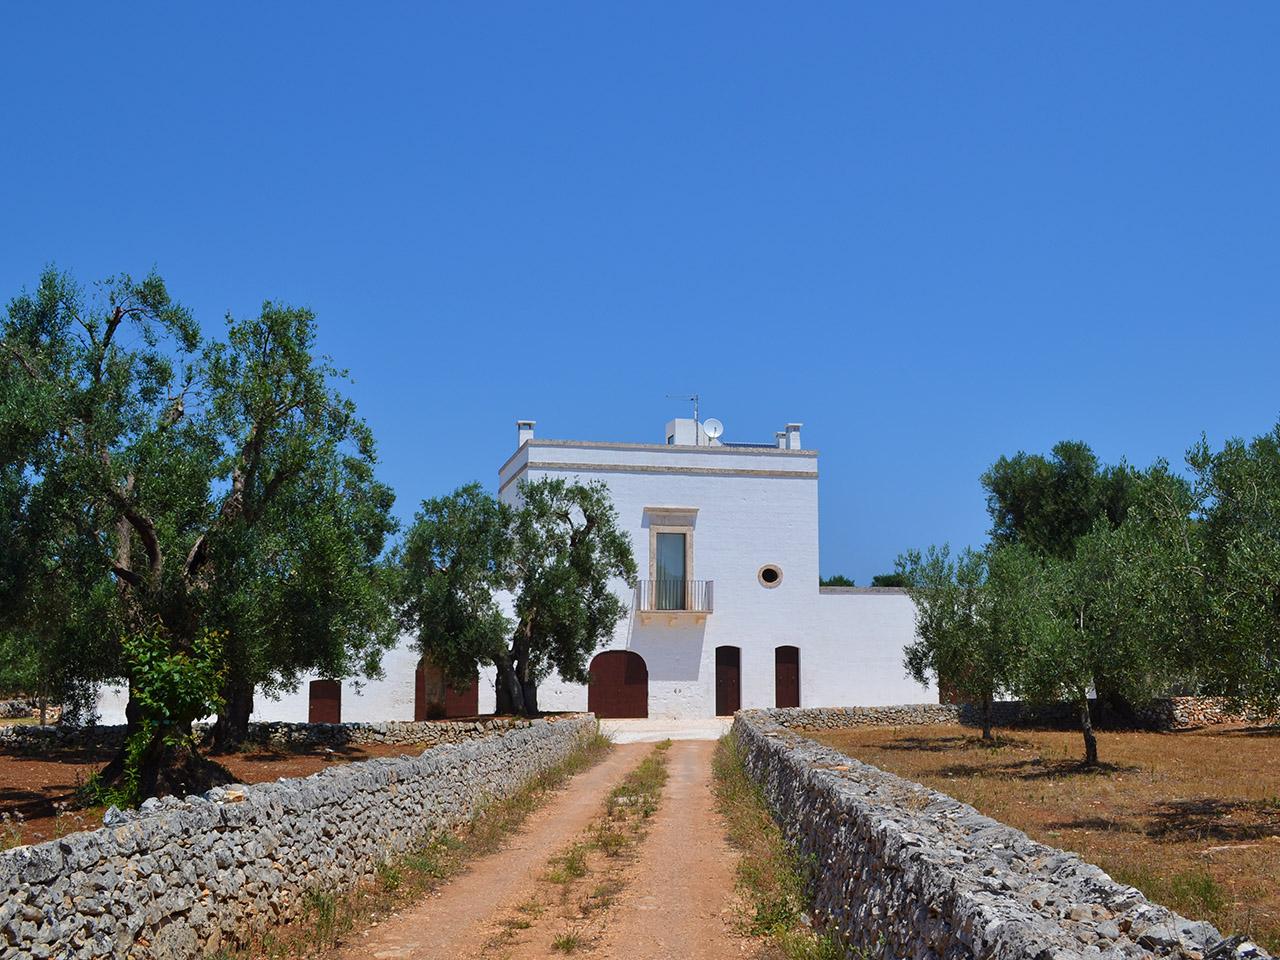 costruzioni restauri sirio ostuni restauro ristrutturazione masseria olive nardo ostuni dsc 5144